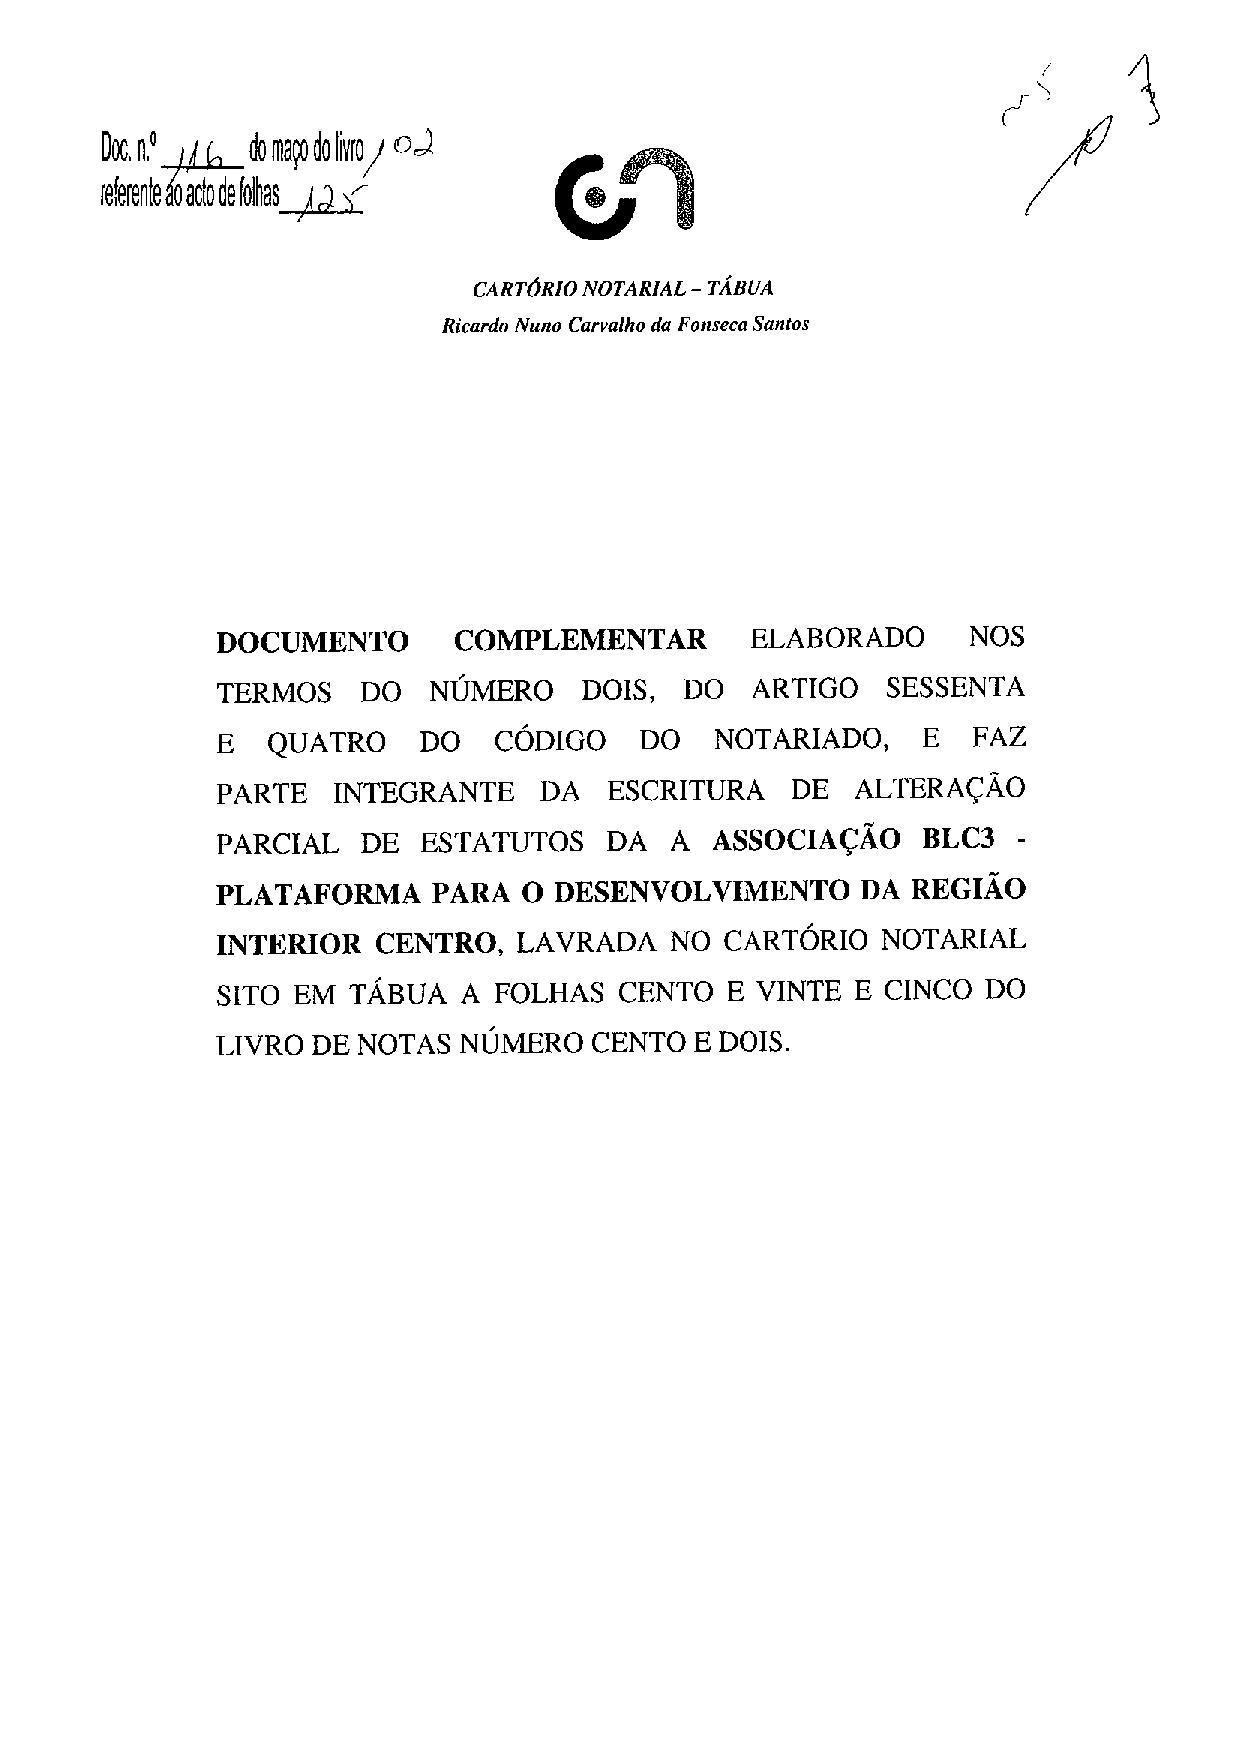 509402267_Associacao_BLC_3a_alteracao (1)-page-006